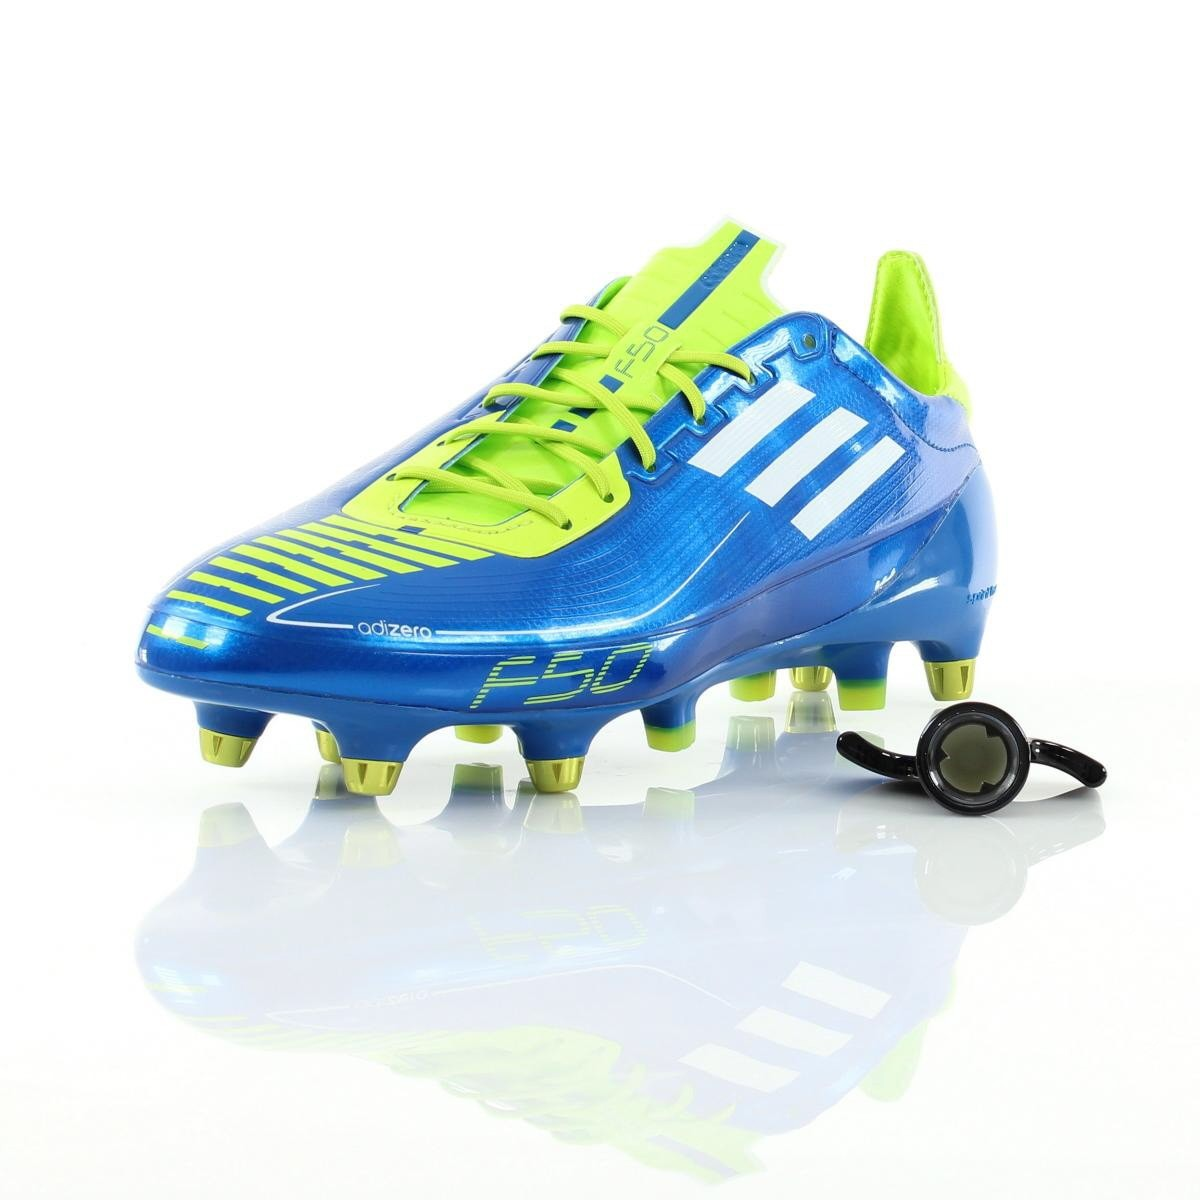 T 31mx adidas F50 Adizero X Trx Sg Tacos Futbol Gym -   1 78d6d00a981a0